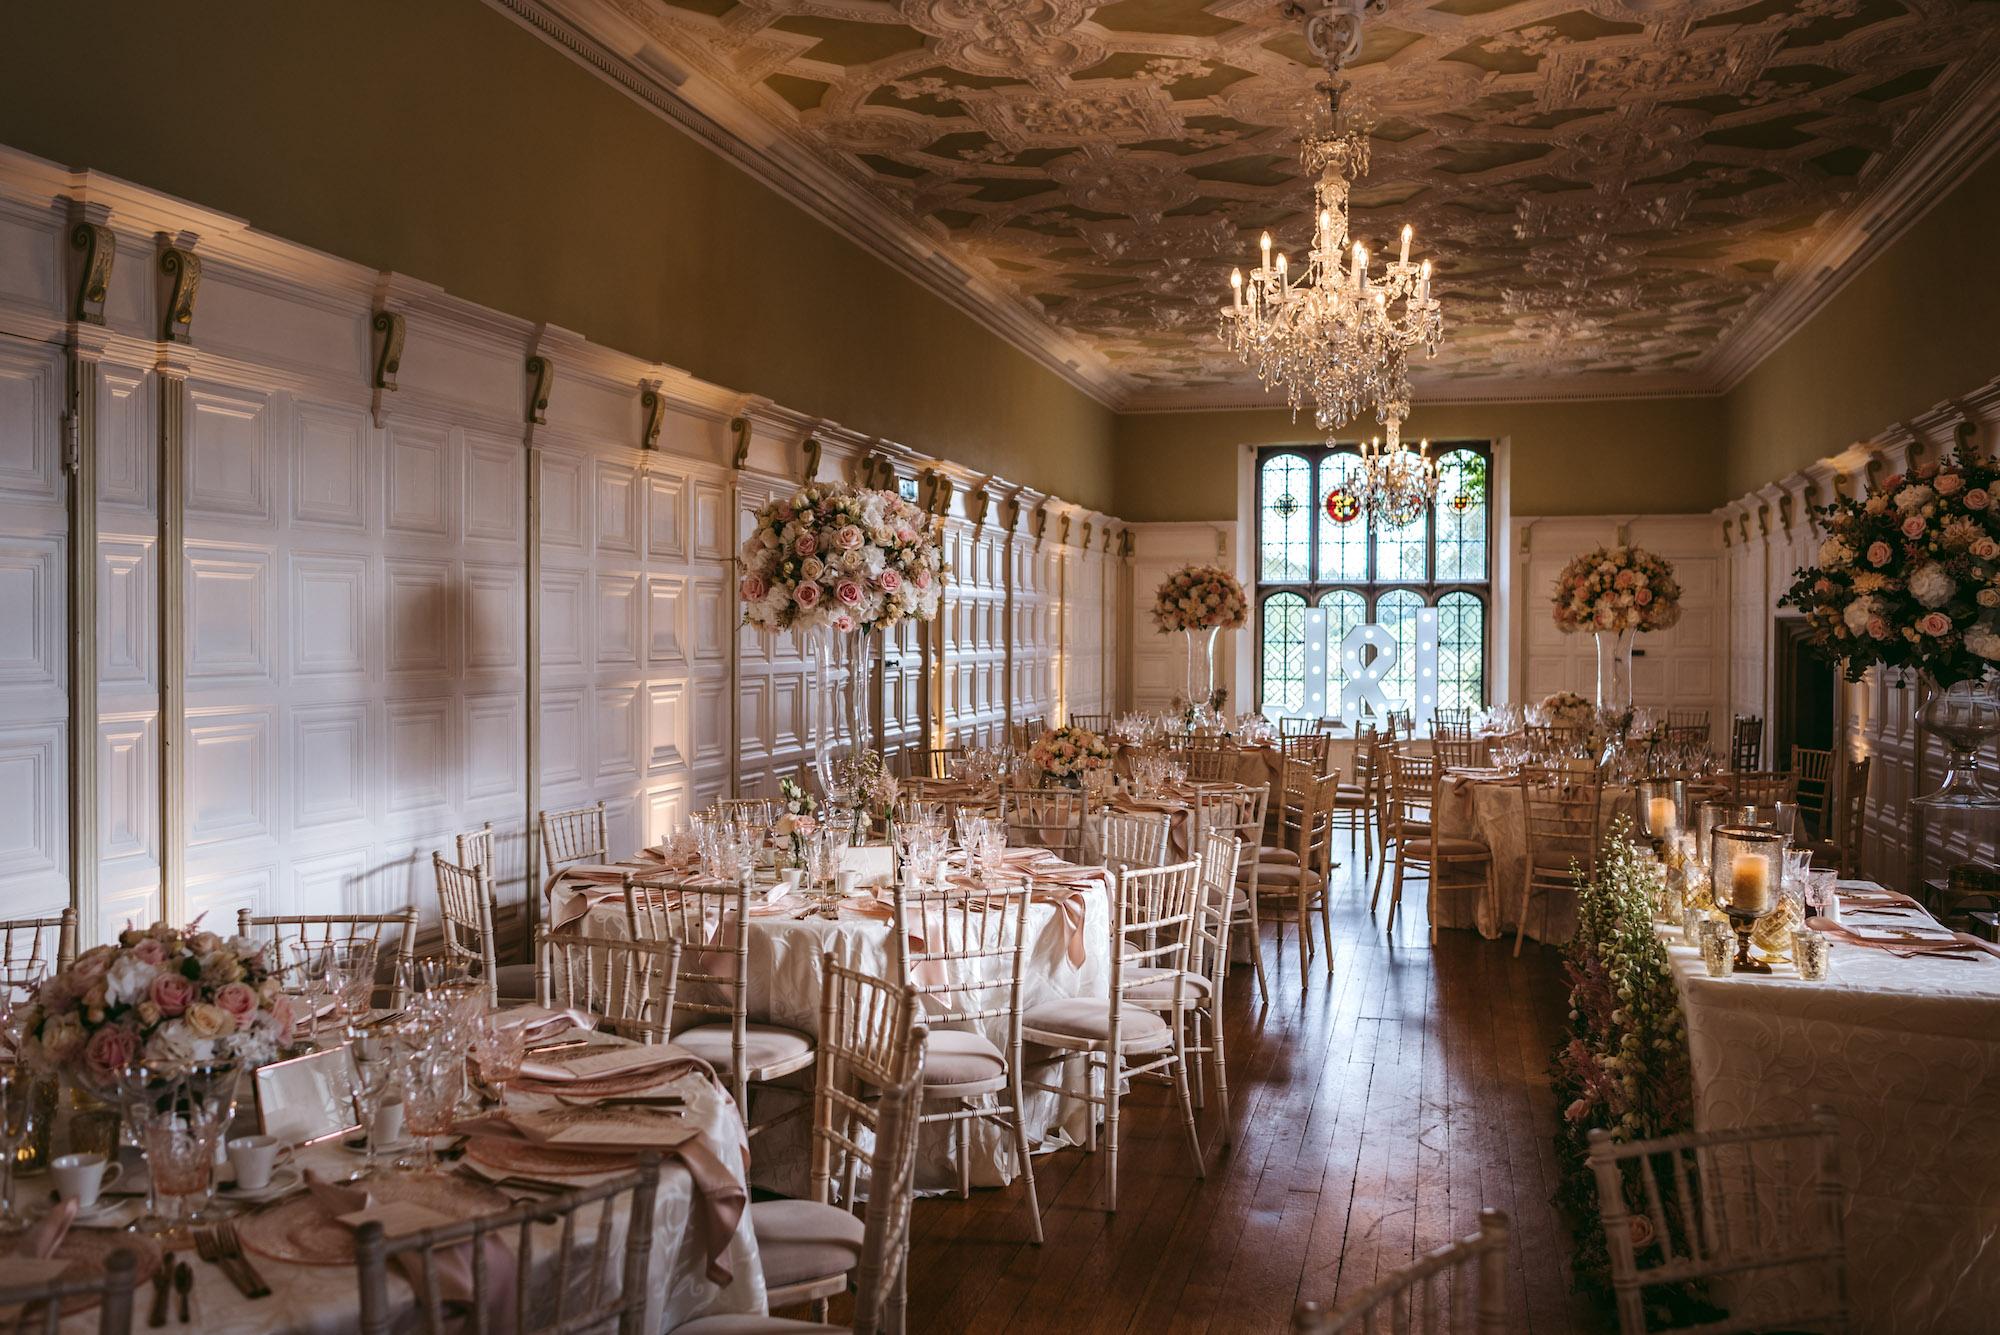 71   Hengrave Hall Wedding   Suffolk Wedding   Lamare London   Luxury Wedding Planner   Jon Mold Photography.jpg